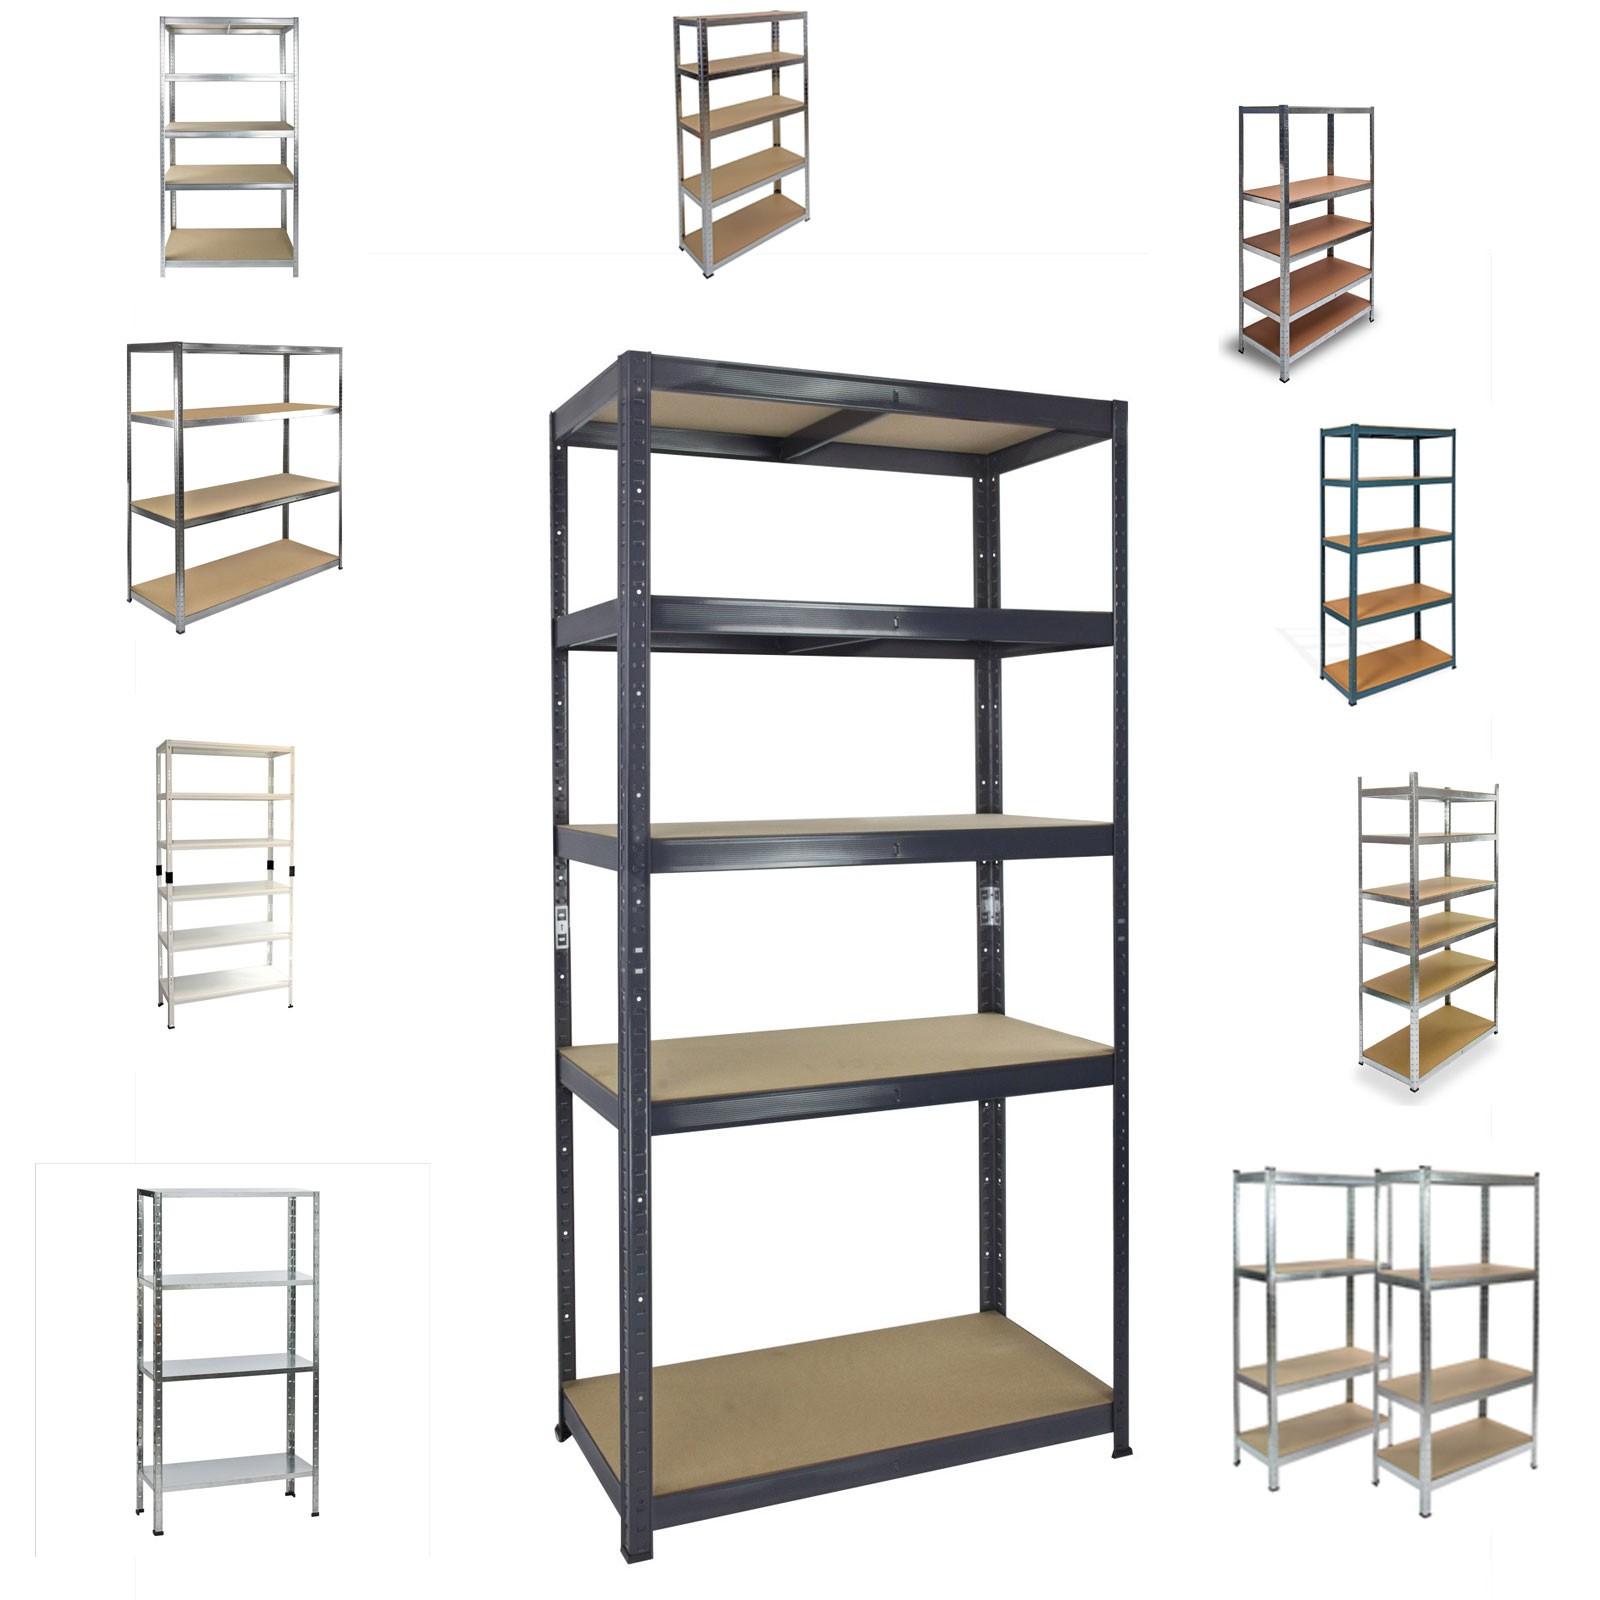 kellerregal steckregal metallregal lagerregal universalregal div modelle auswahl ebay. Black Bedroom Furniture Sets. Home Design Ideas